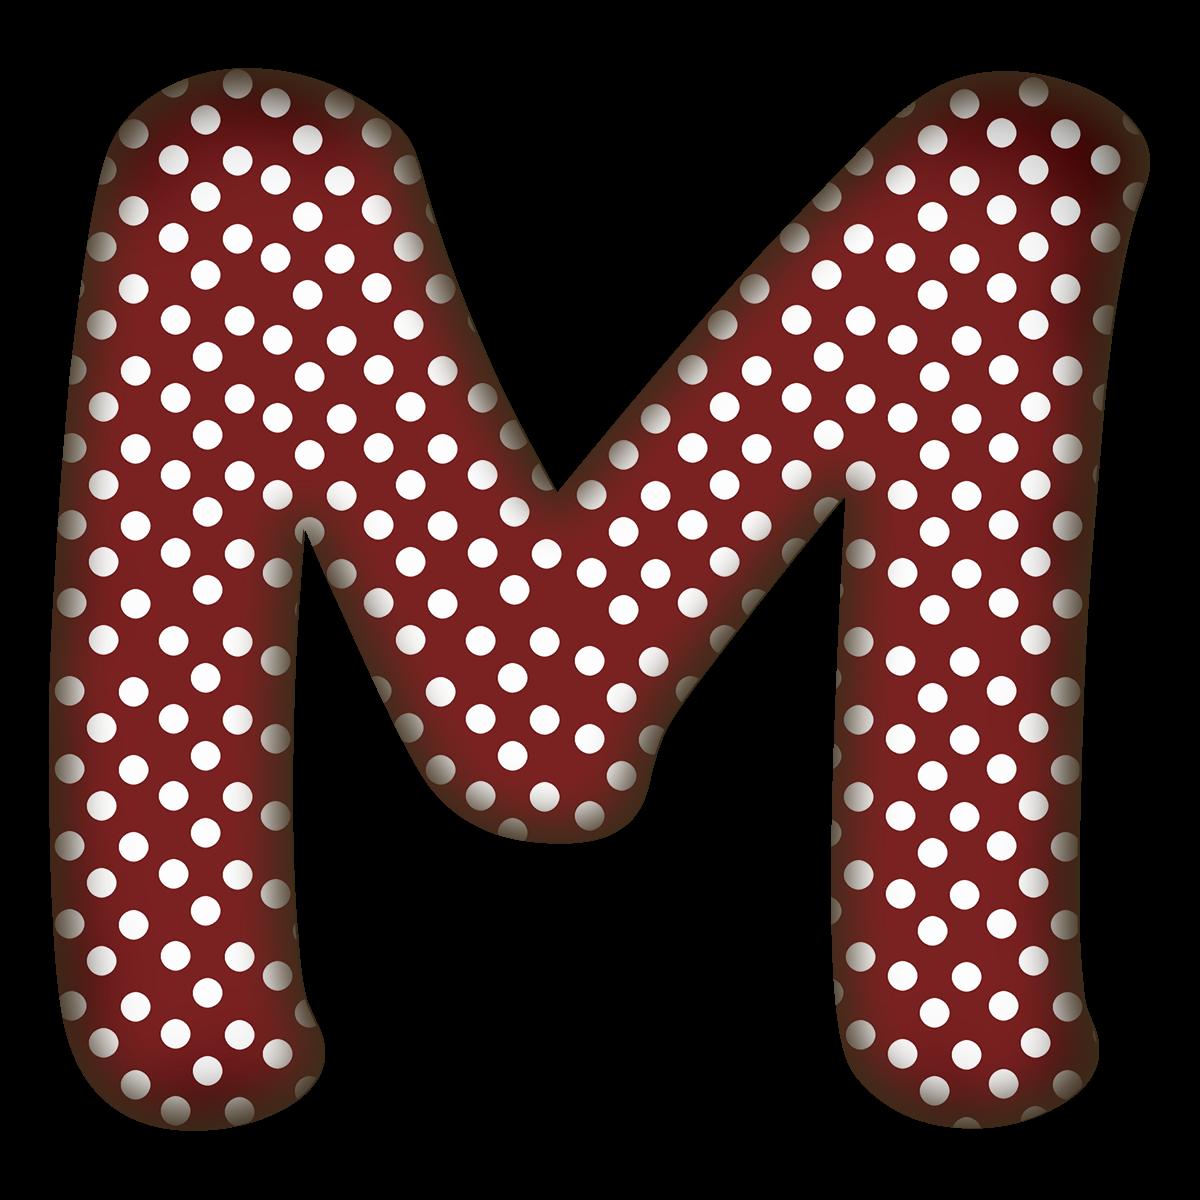 3d Alphabet Cell Phone Wallpaper Free Wallpaper Of Letter M Wallpaper202